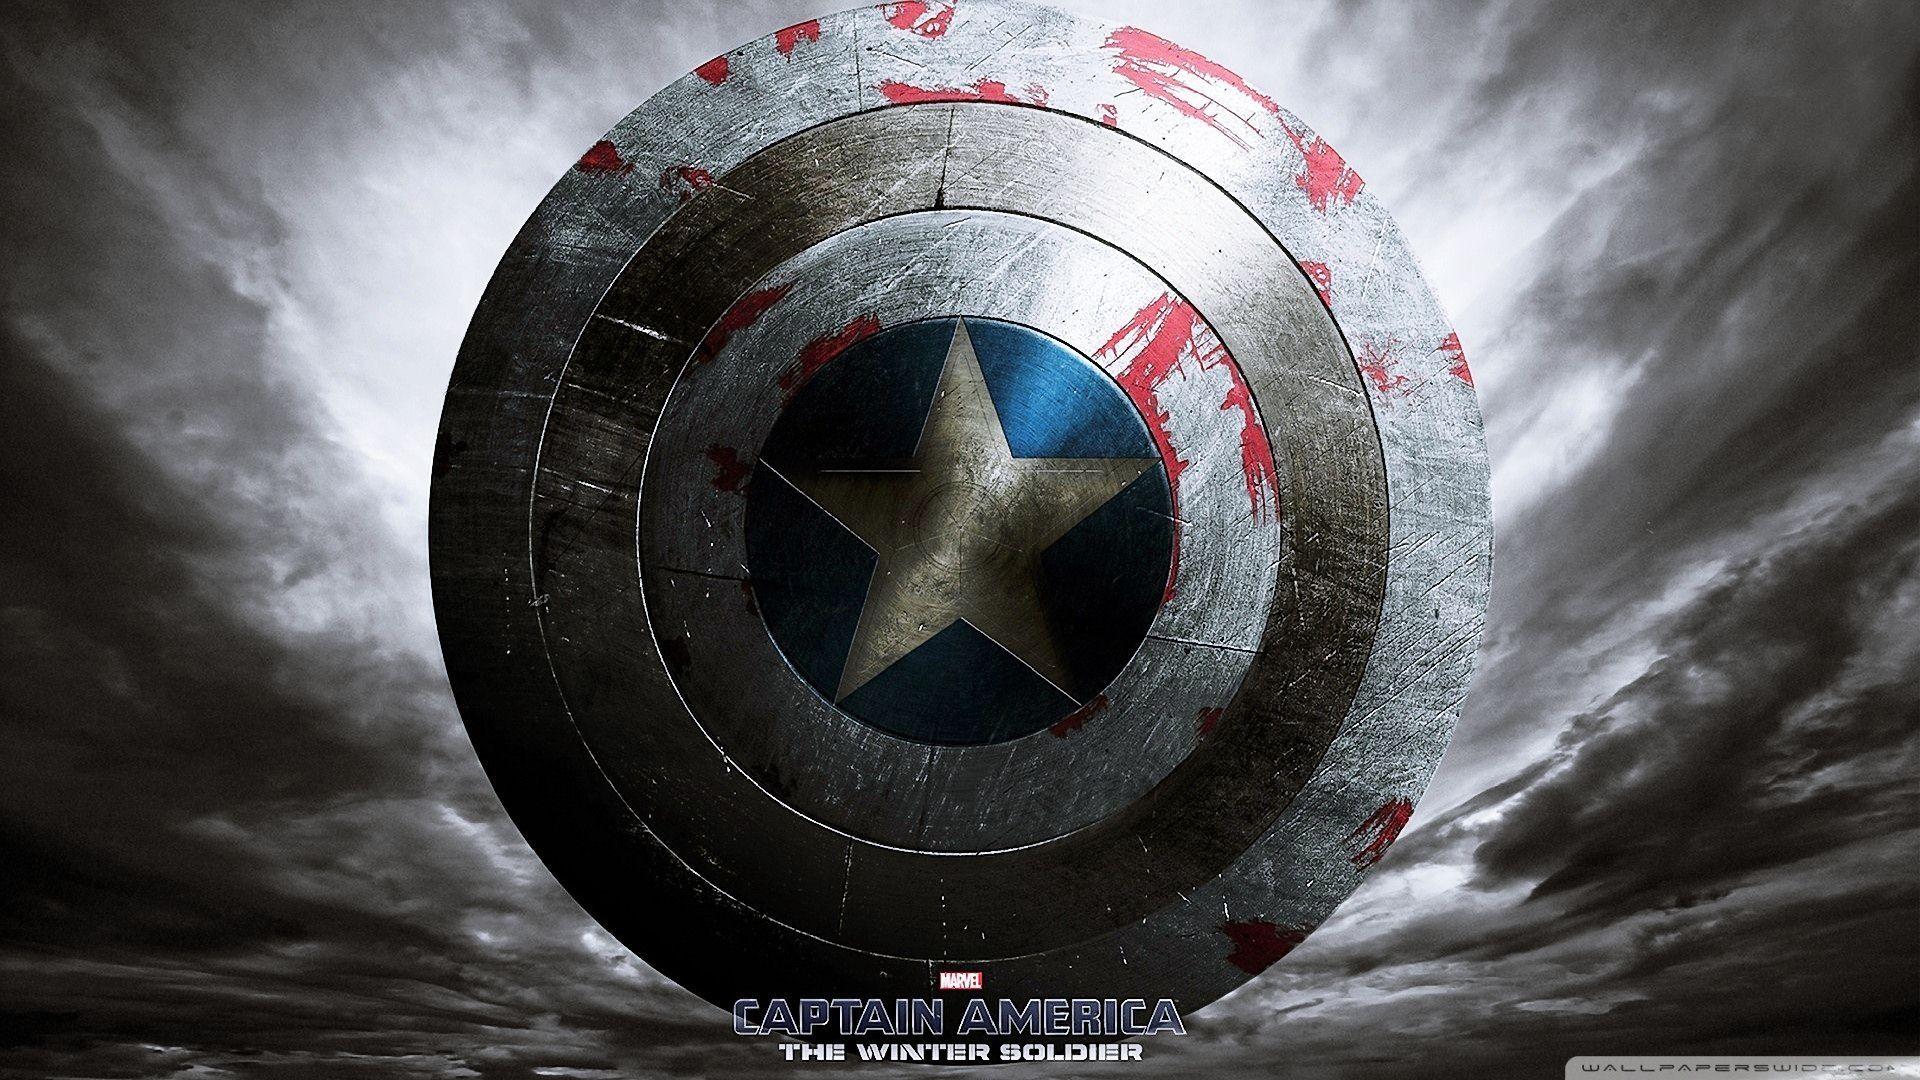 Captain America The Winter Soldier Shield Wallpaper Hd Desktop Captain America Shield Wallpaper Shield Wallpaper Captain America Winter Soldier